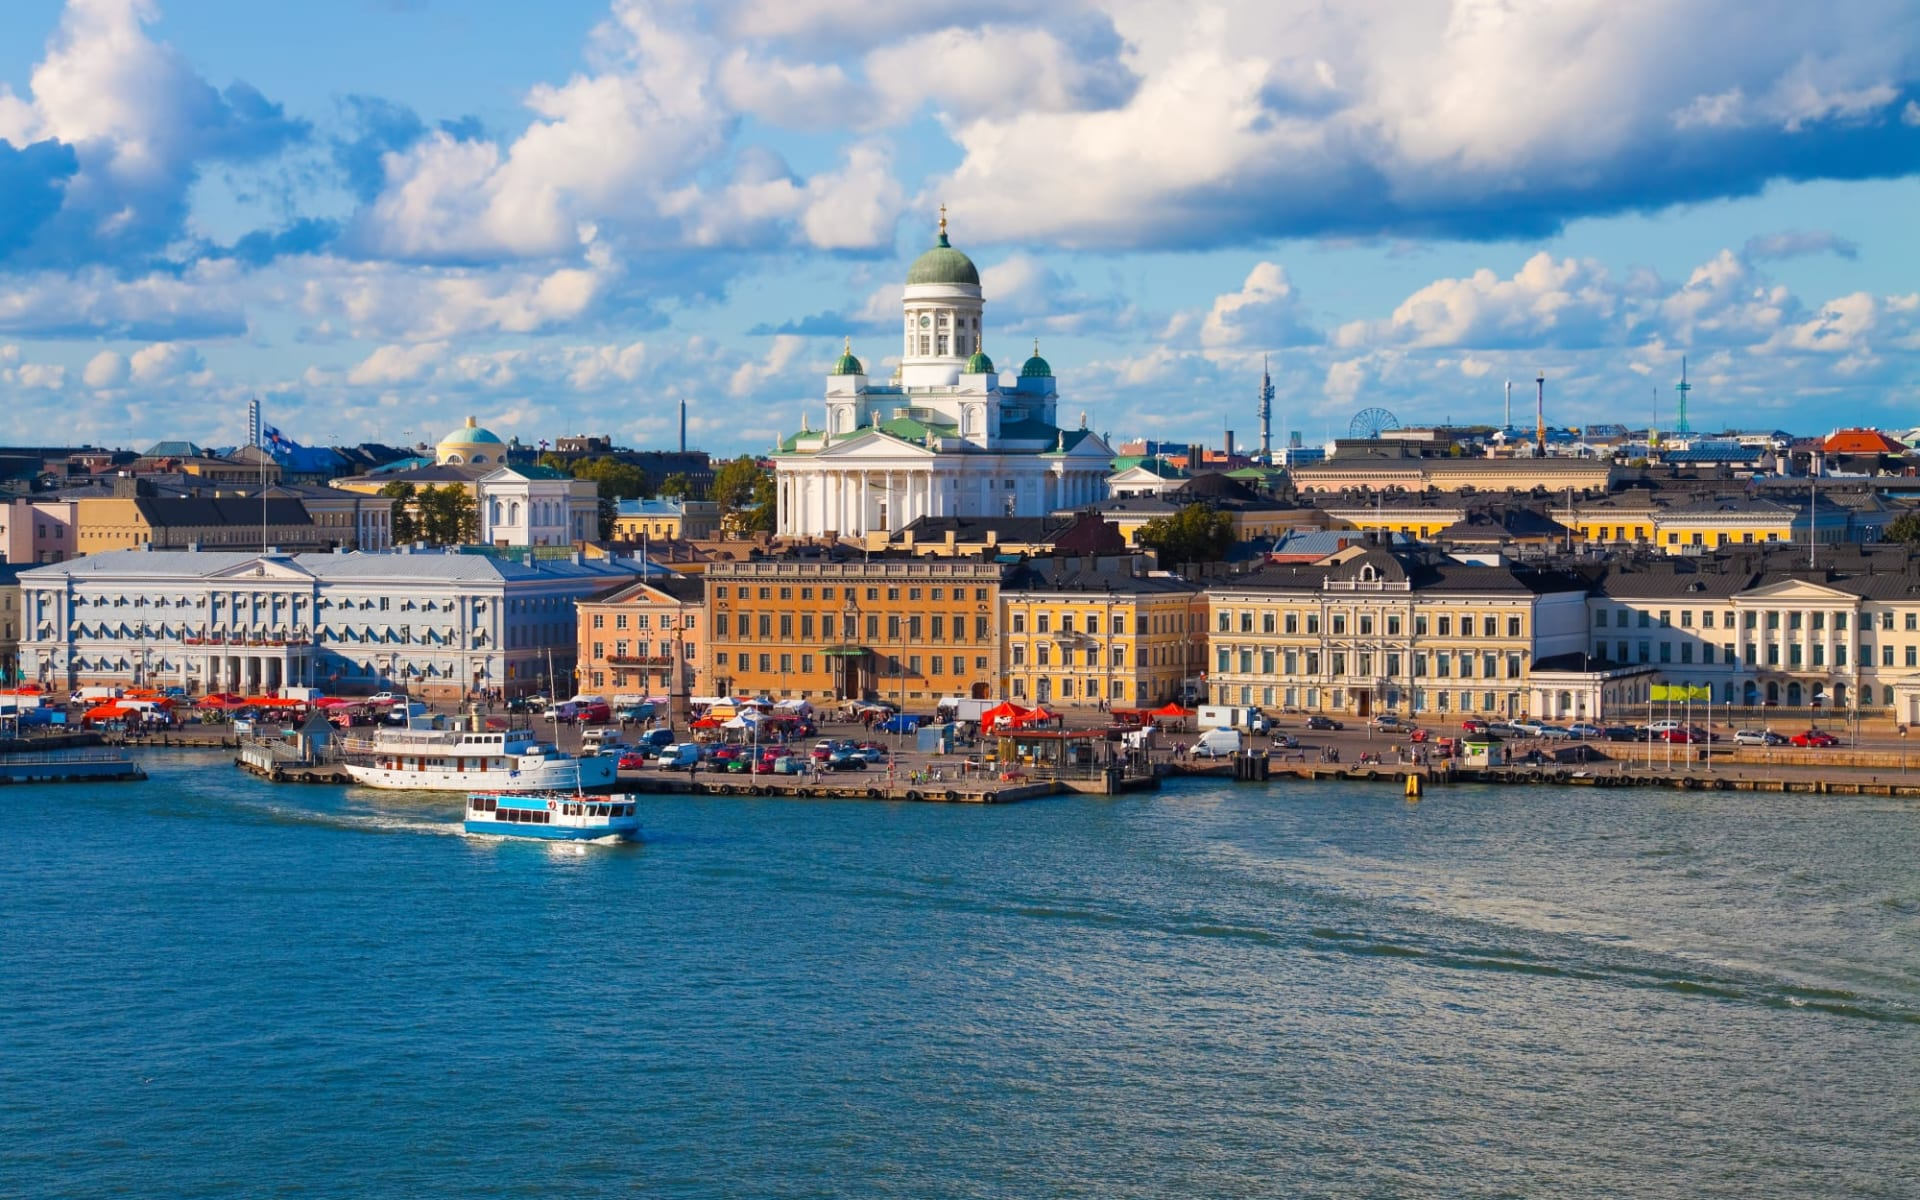 Sokos Hotel Vaakuna in Helsinki: Finnland Helsinki Stadtpanorama